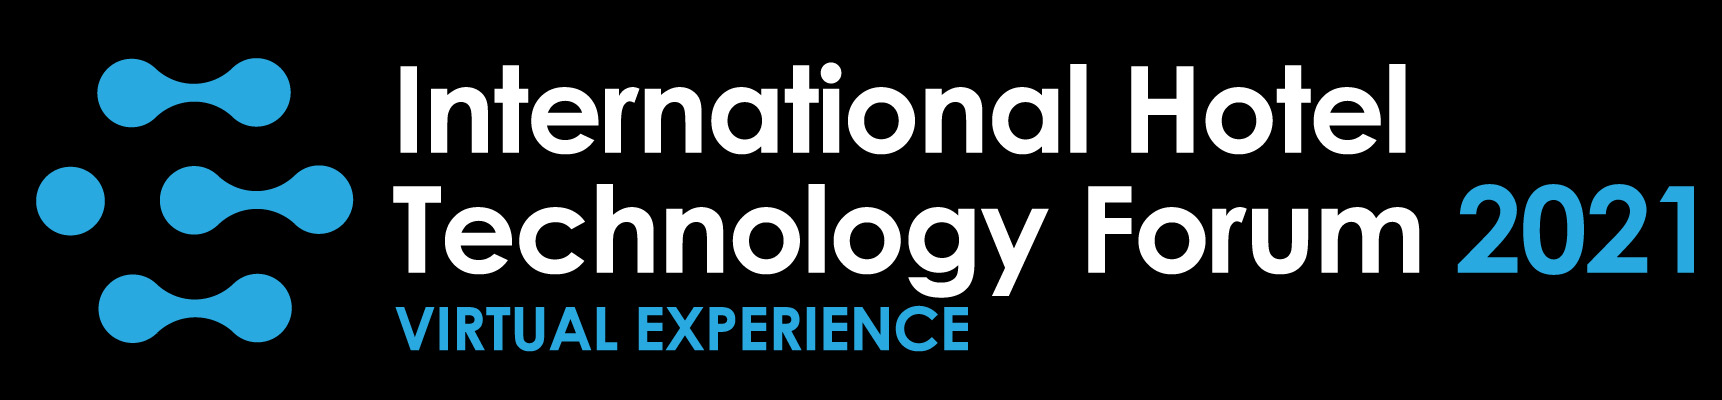 International Hotel Technology Forum 2021